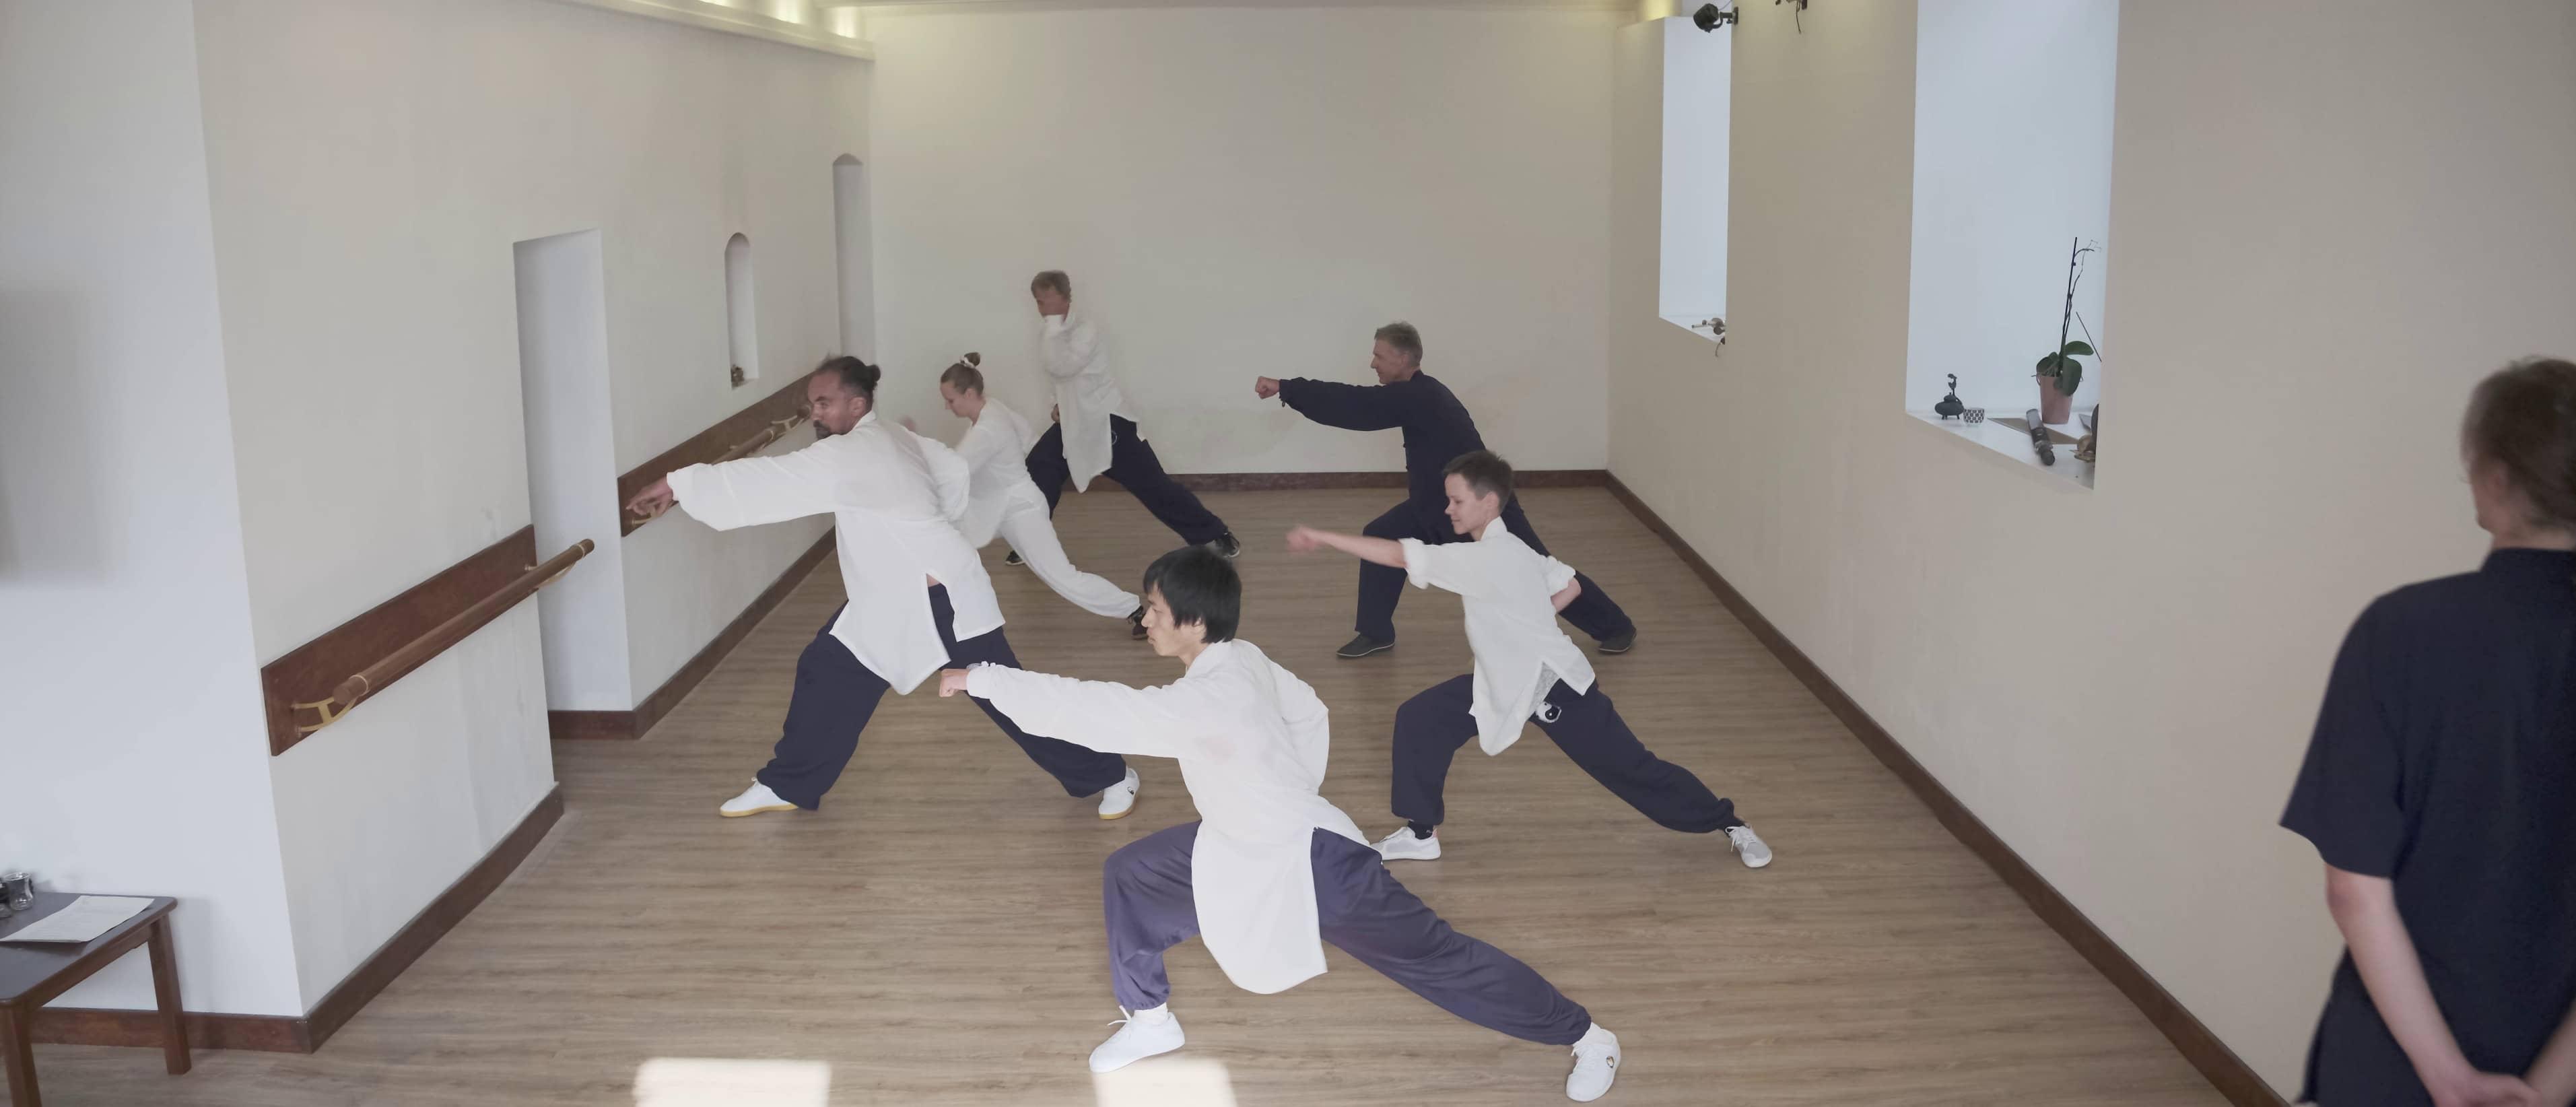 Jibenquan Basic Group Training